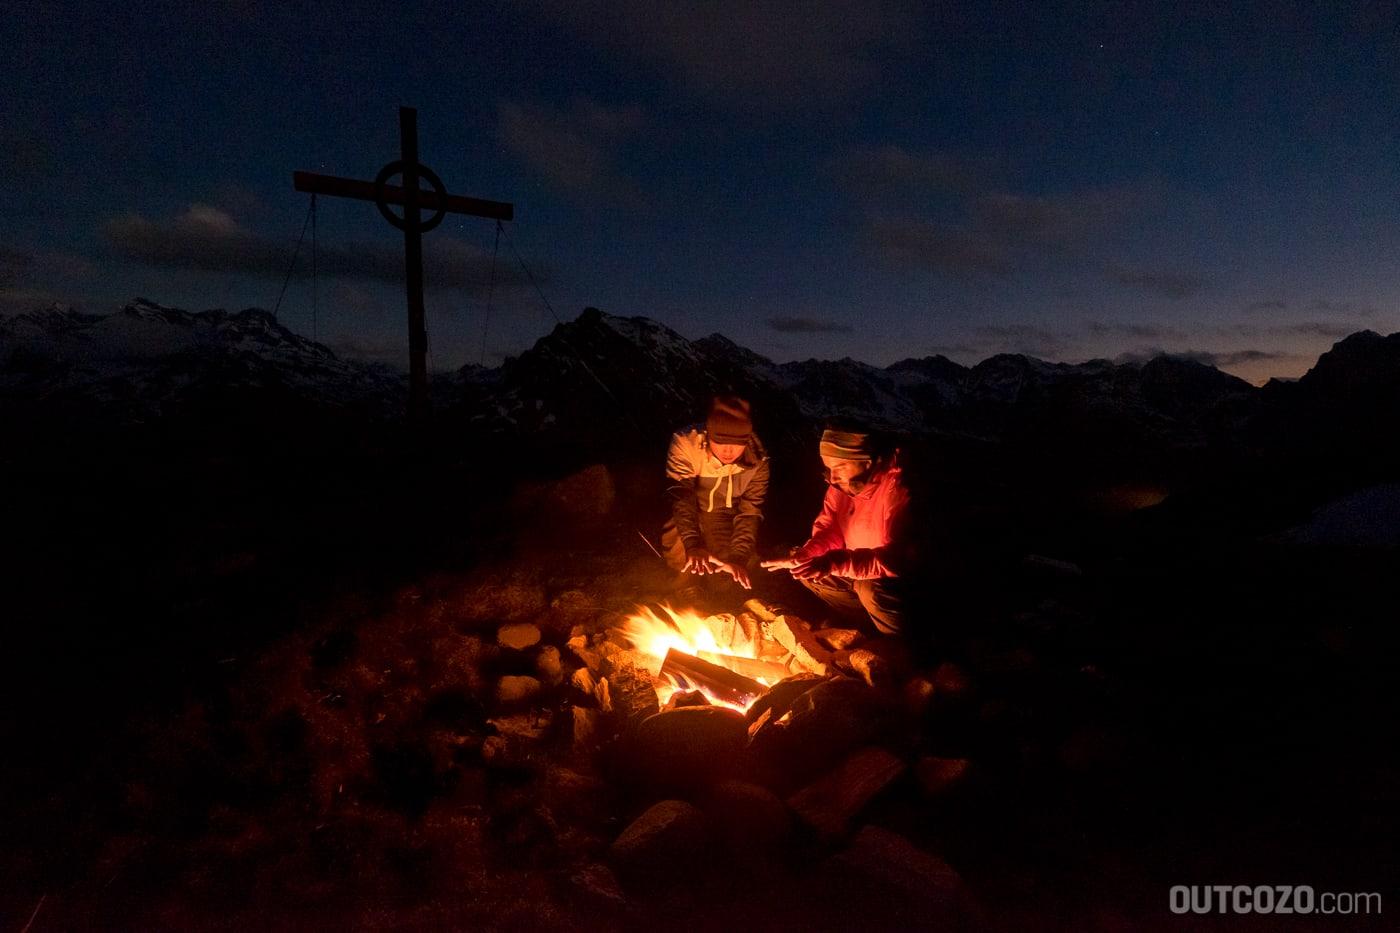 Hörgerät am Berg mit Lagerfeuer